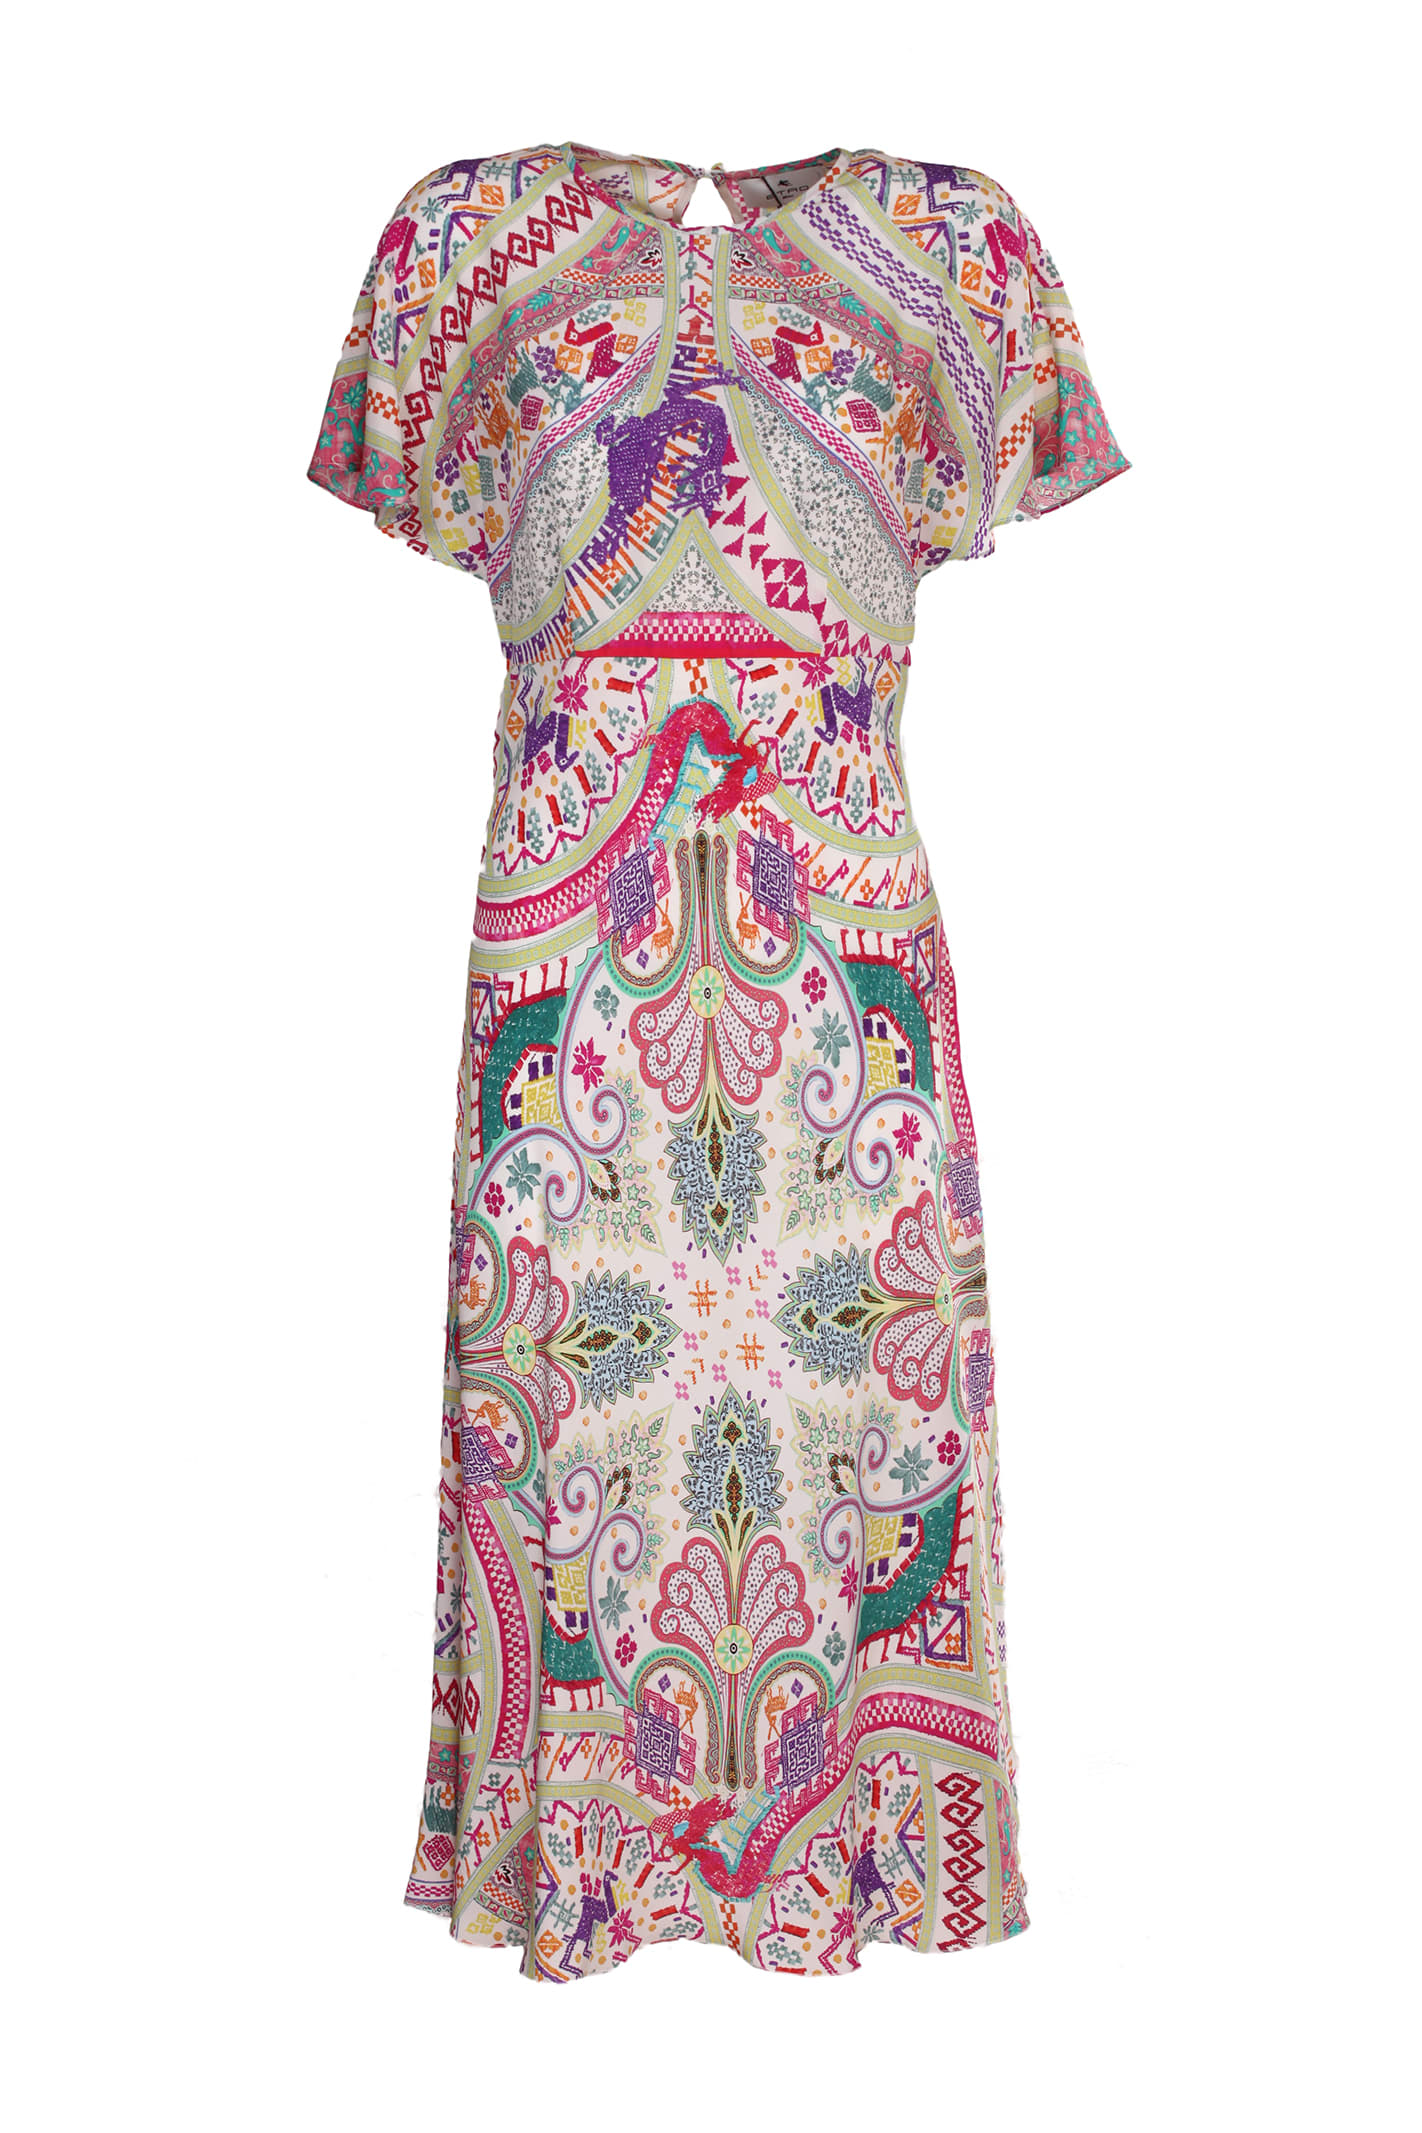 Etro Crepe De Chine Dress, Decorated